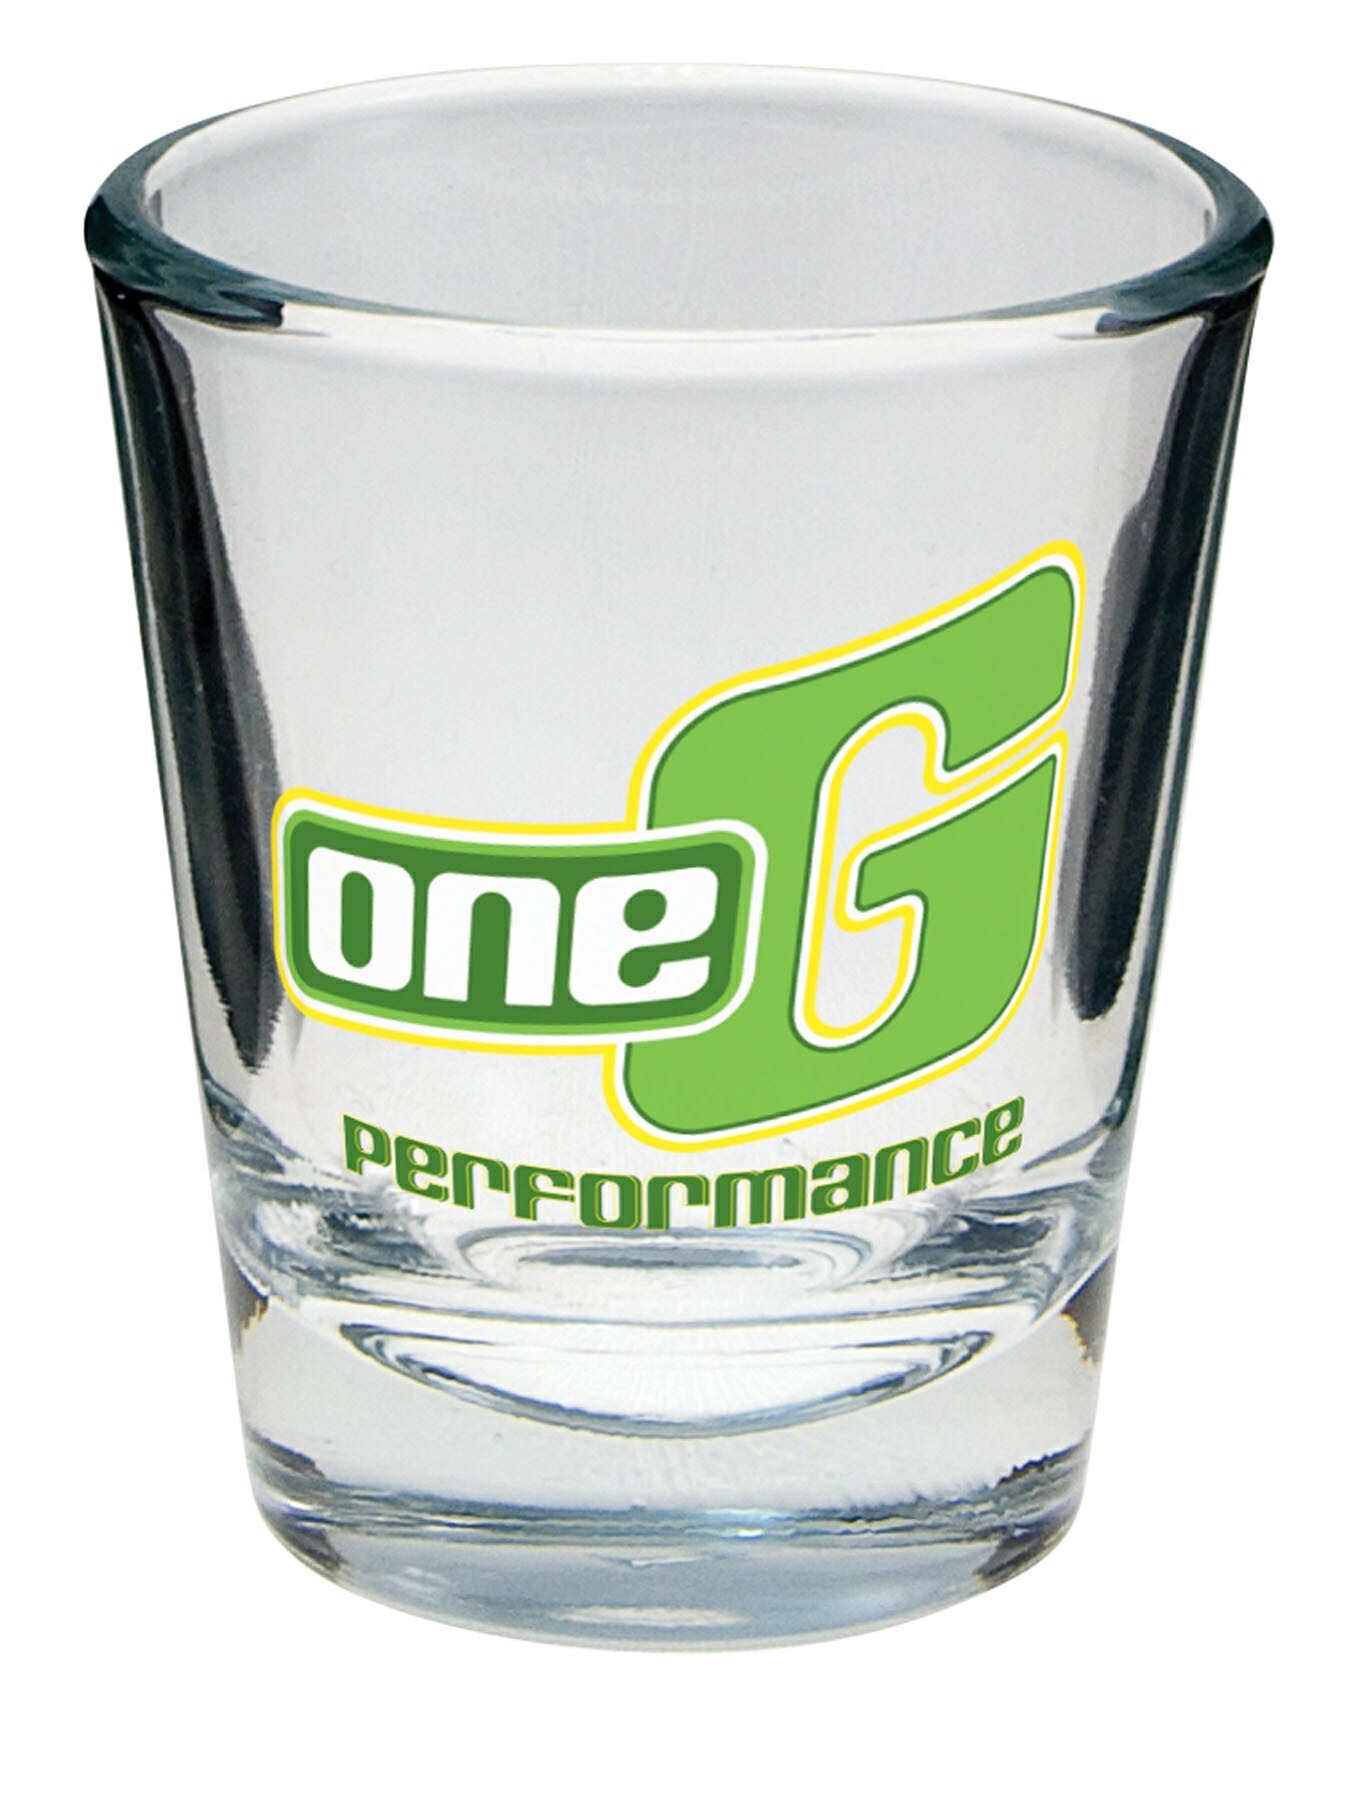 1 1/2 Oz. Clear Glass Shot Glass